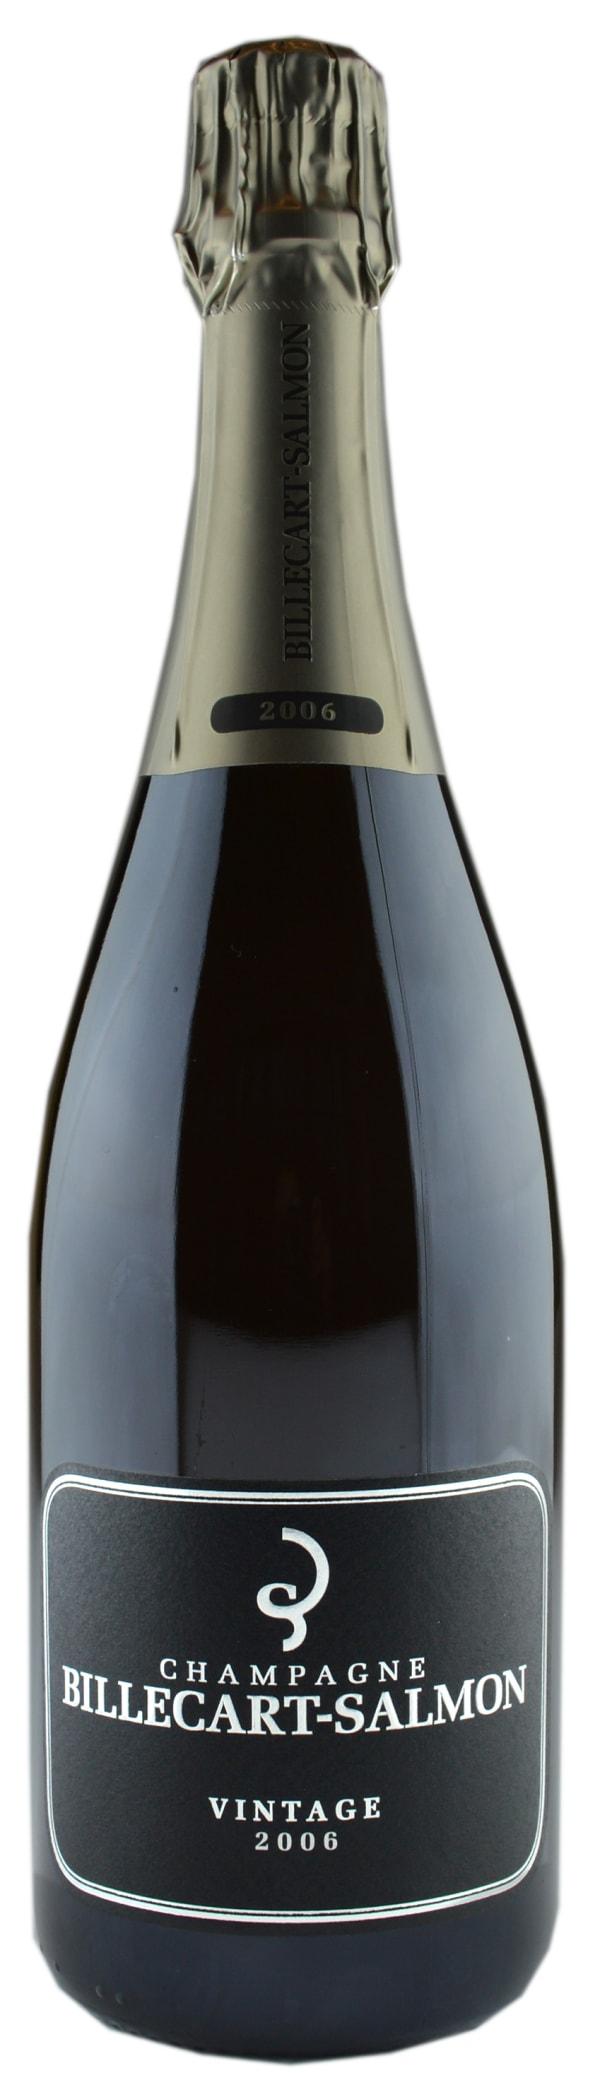 Billecart-Salmon Vintage Champagne Extra Brut  2006